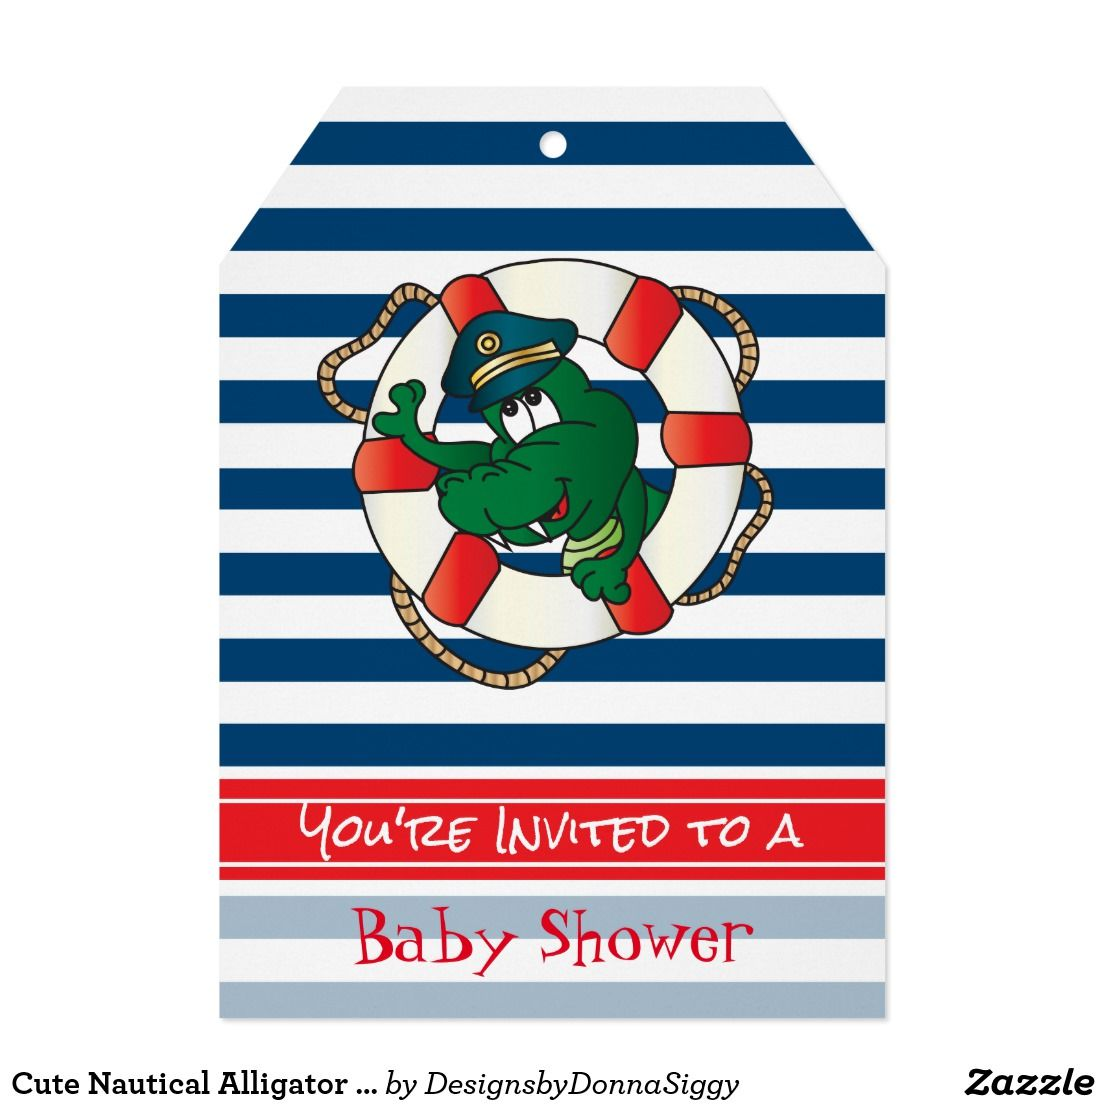 Cute Nautical Alligator Baby Shower Theme | Baby Shower Invitations ...